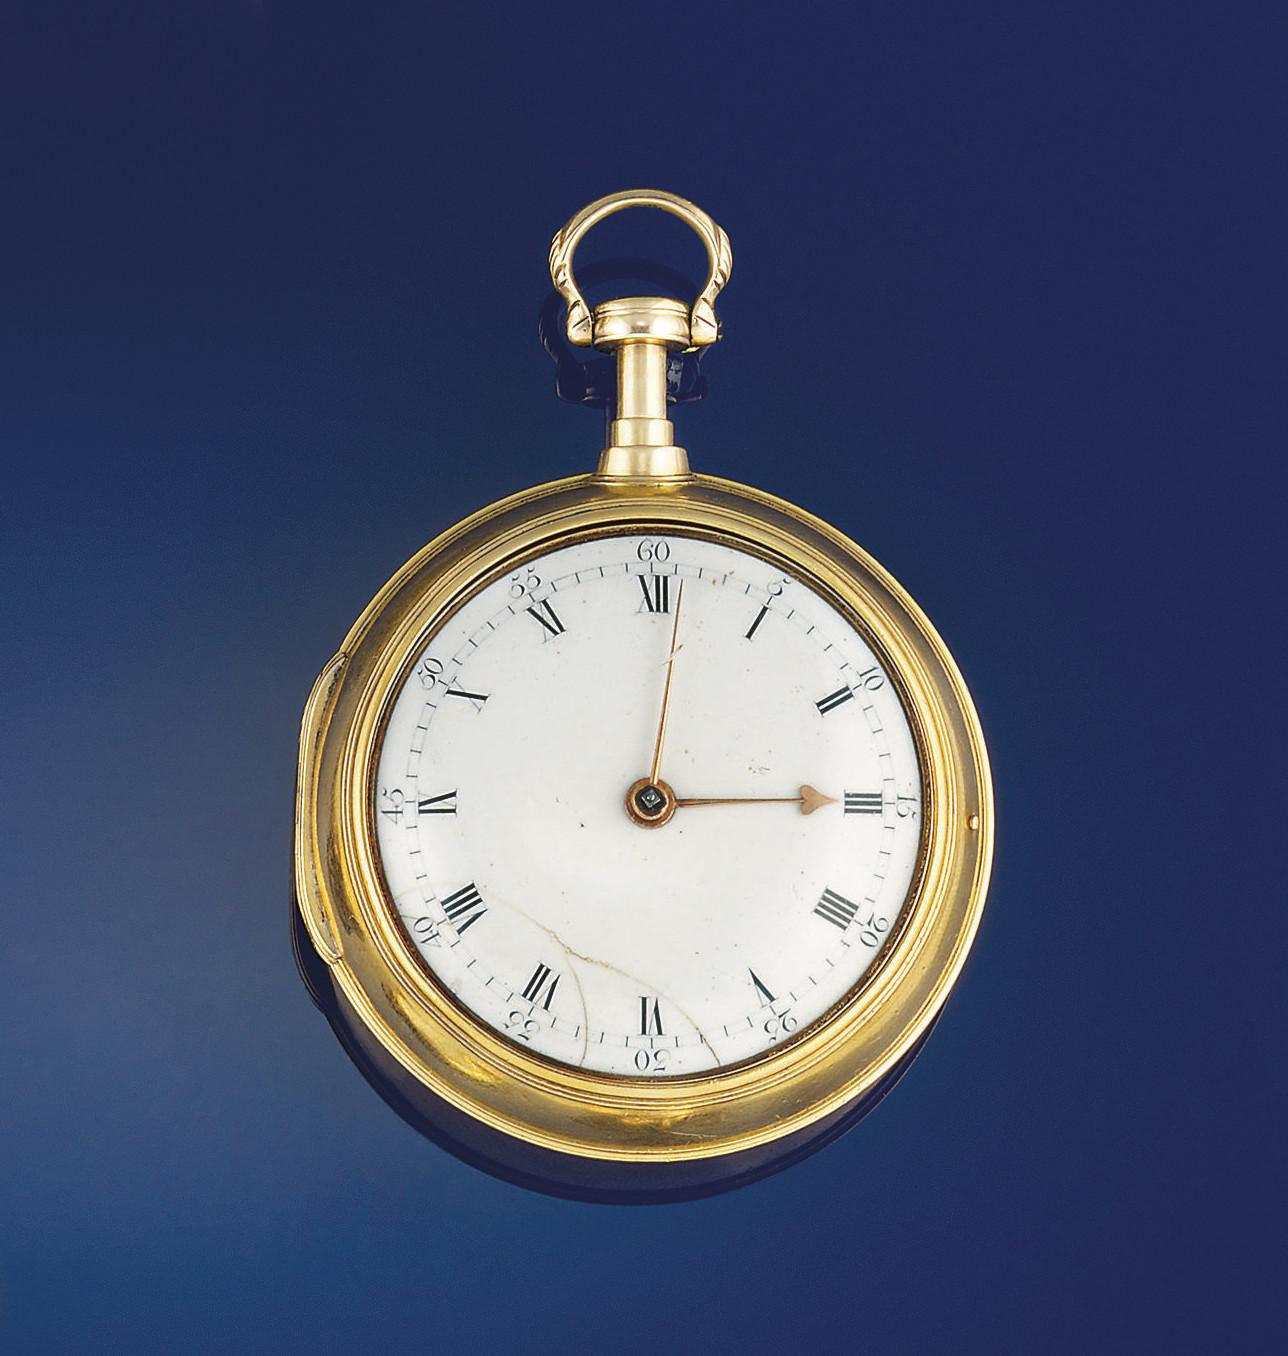 A late 18th century gold repea